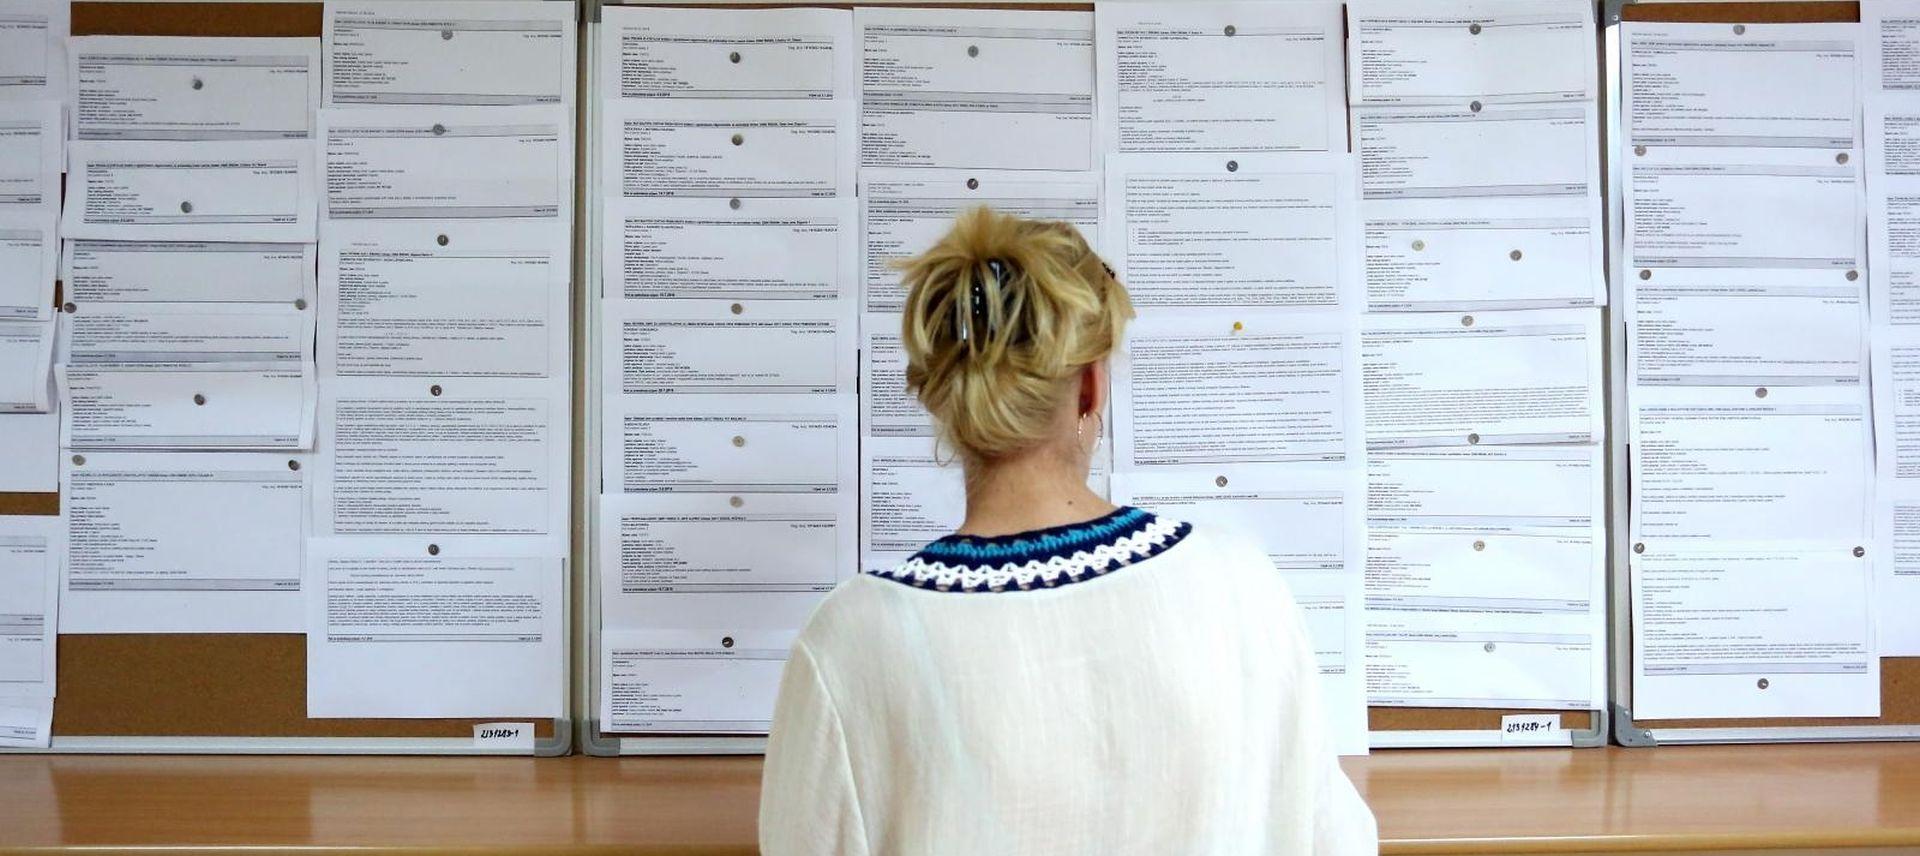 EUROSTAT Stopa nezaposlenosti u Hrvatskoj blago pala